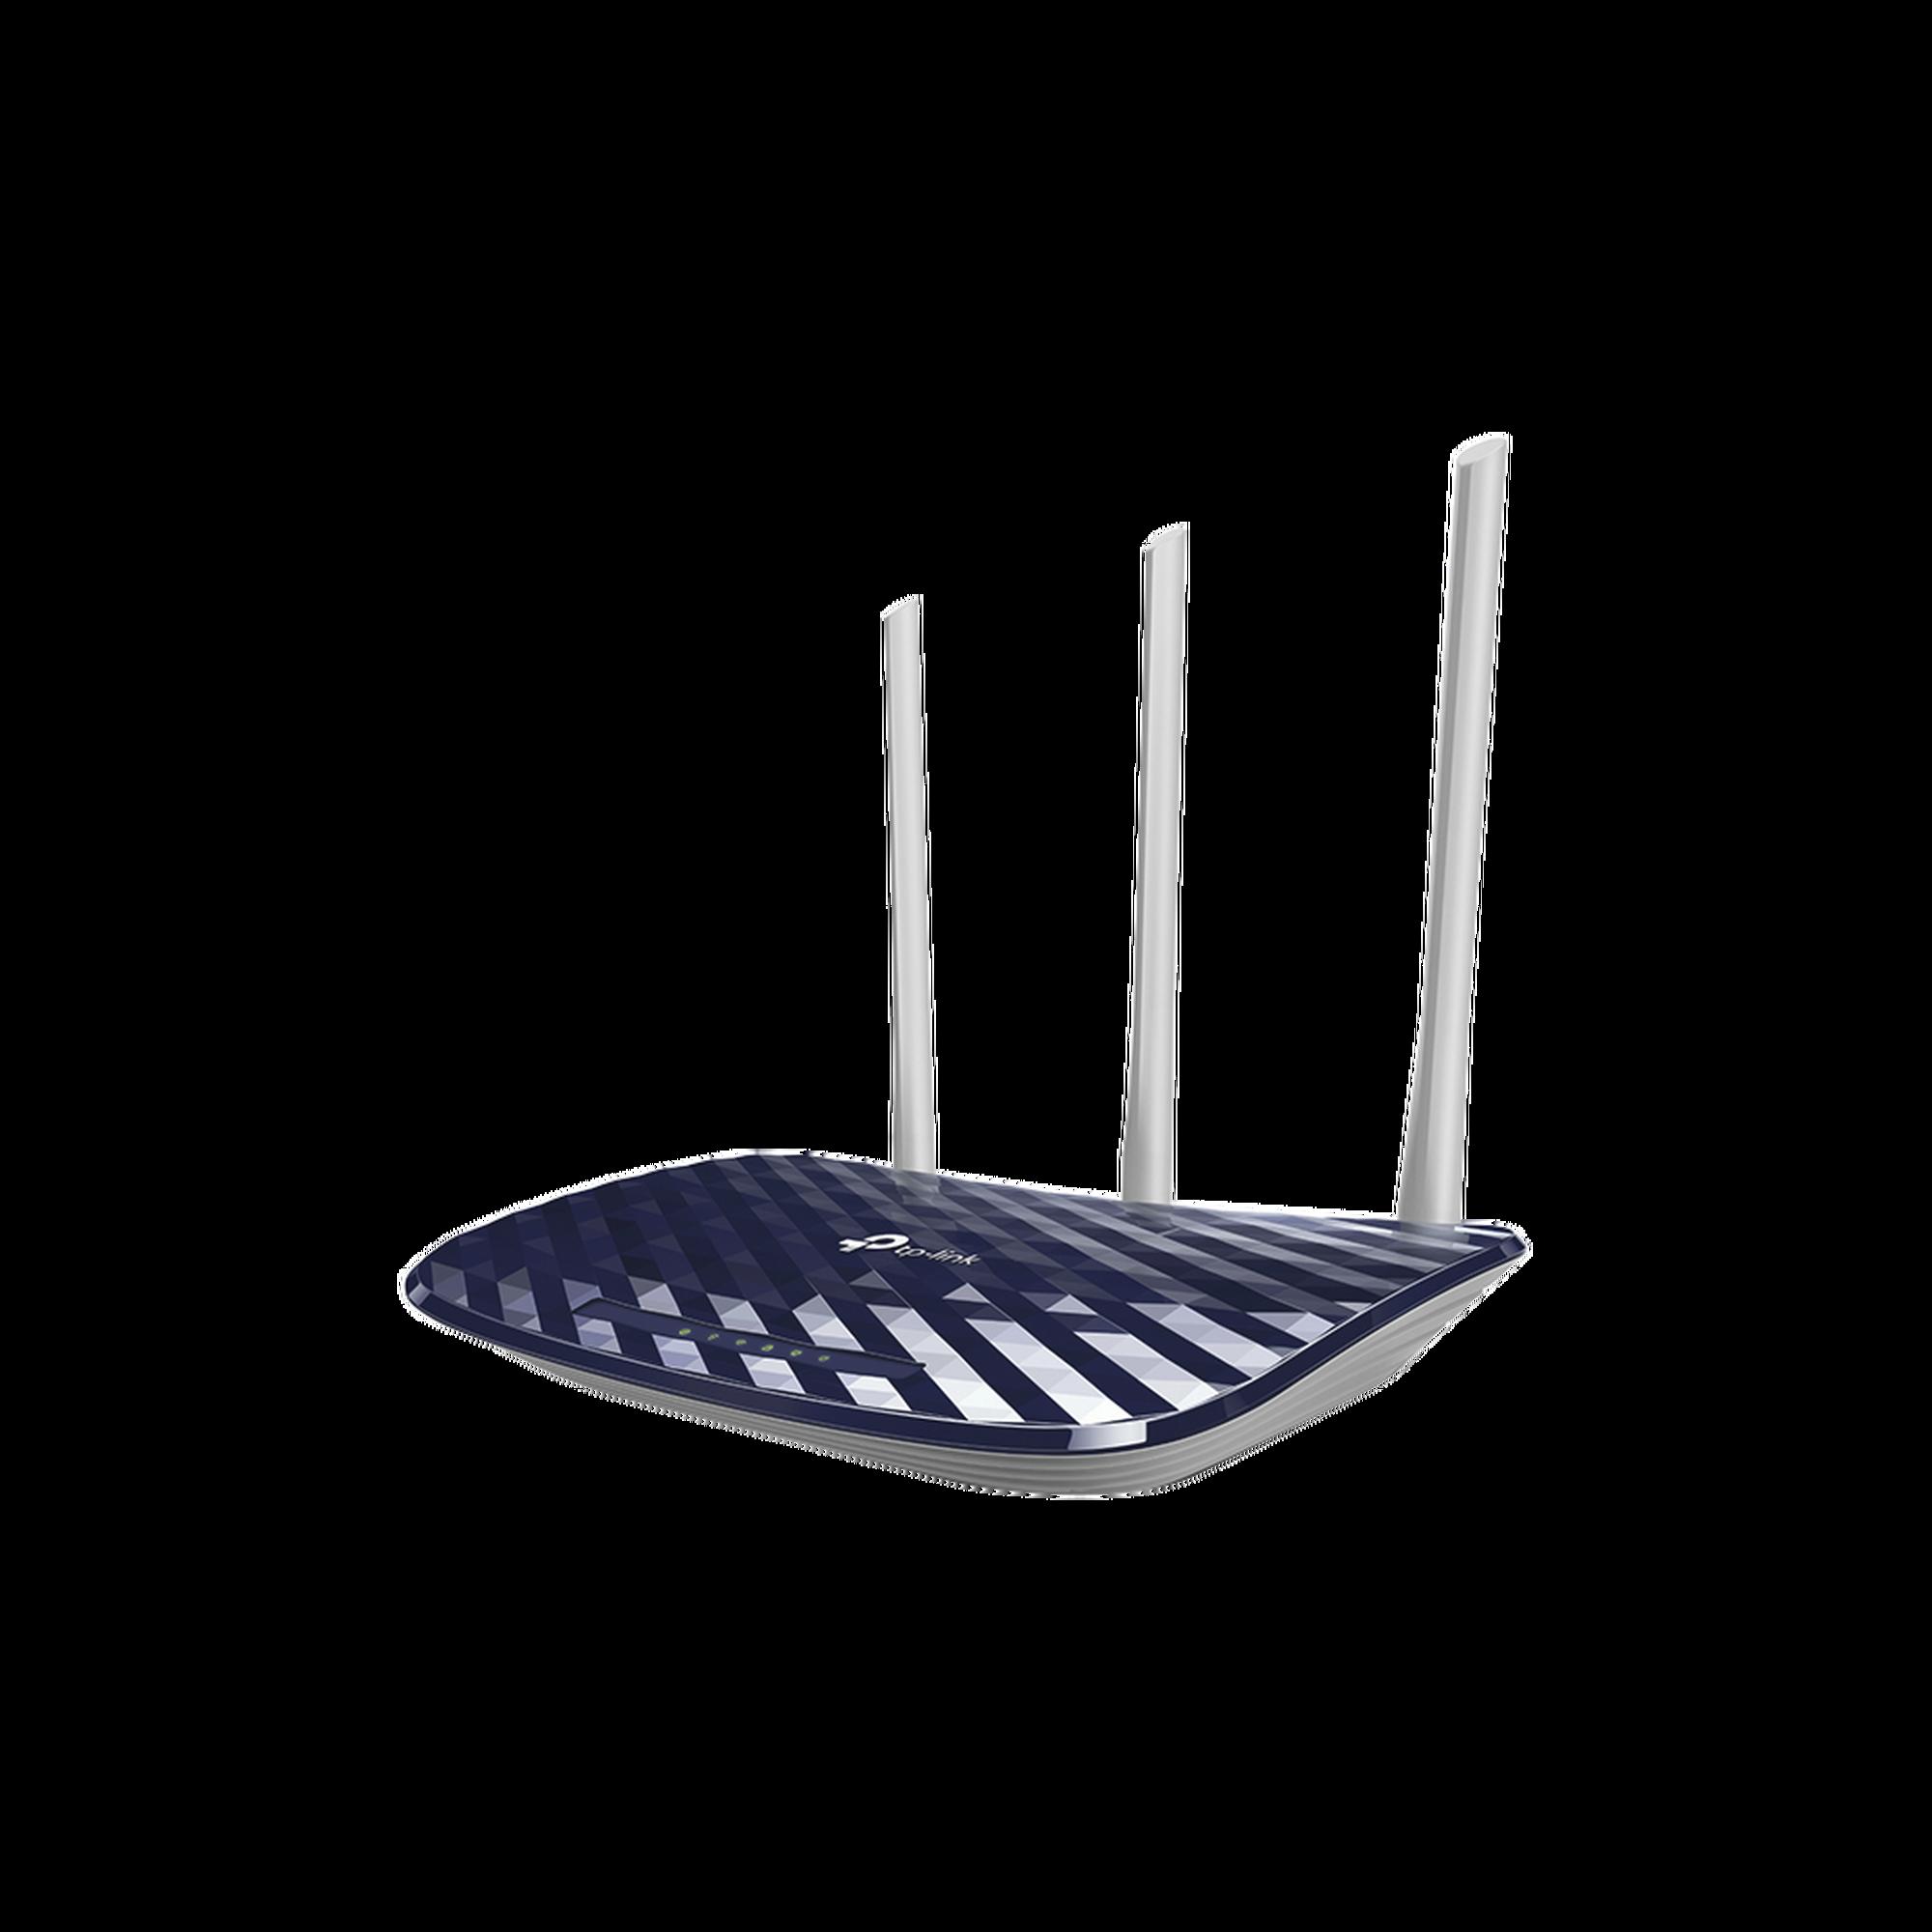 Router Inalámbrico WISP con Configuración de fábrica personalizable, doble banda AC, con antenas de alta ganancia, hasta 733 Mbps, 4 Puertos LAN 10/100 Mbps, 1 Puerto WAN 10/100 Mbps